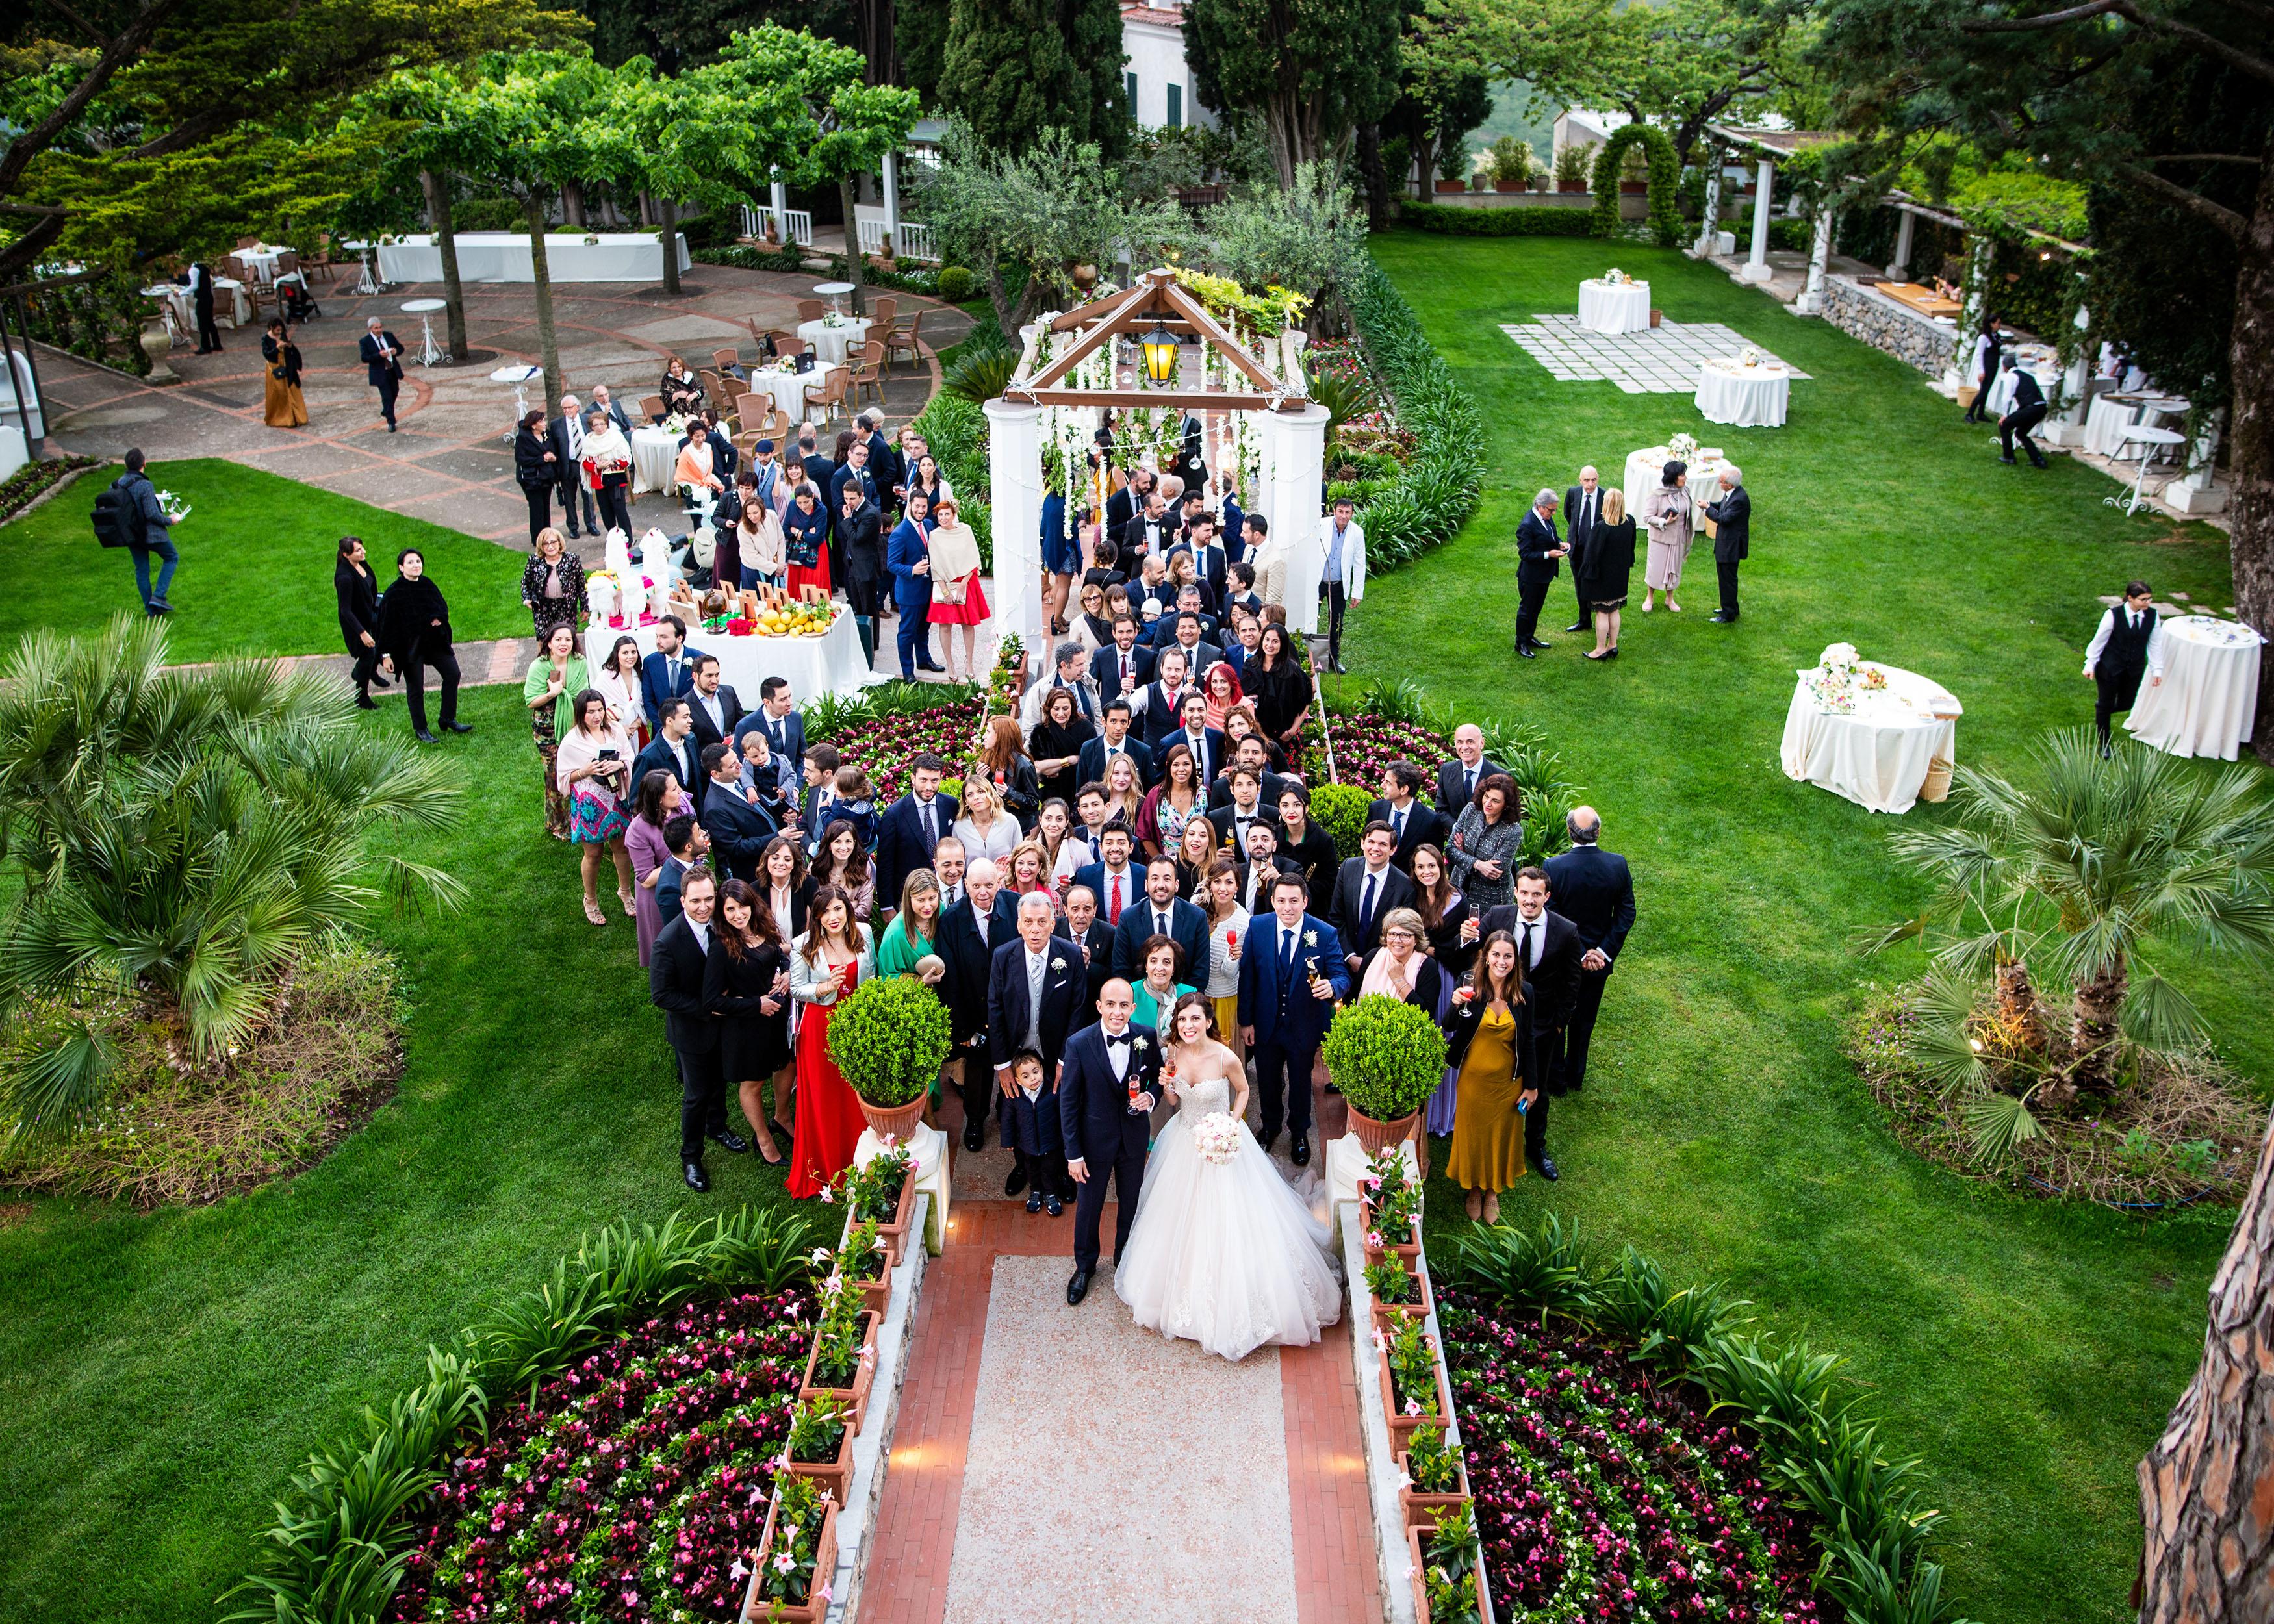 http://www.weddingamalfi.com/wp-content/uploads/Katia-Jorge-18-maggio-2019-37.jpg